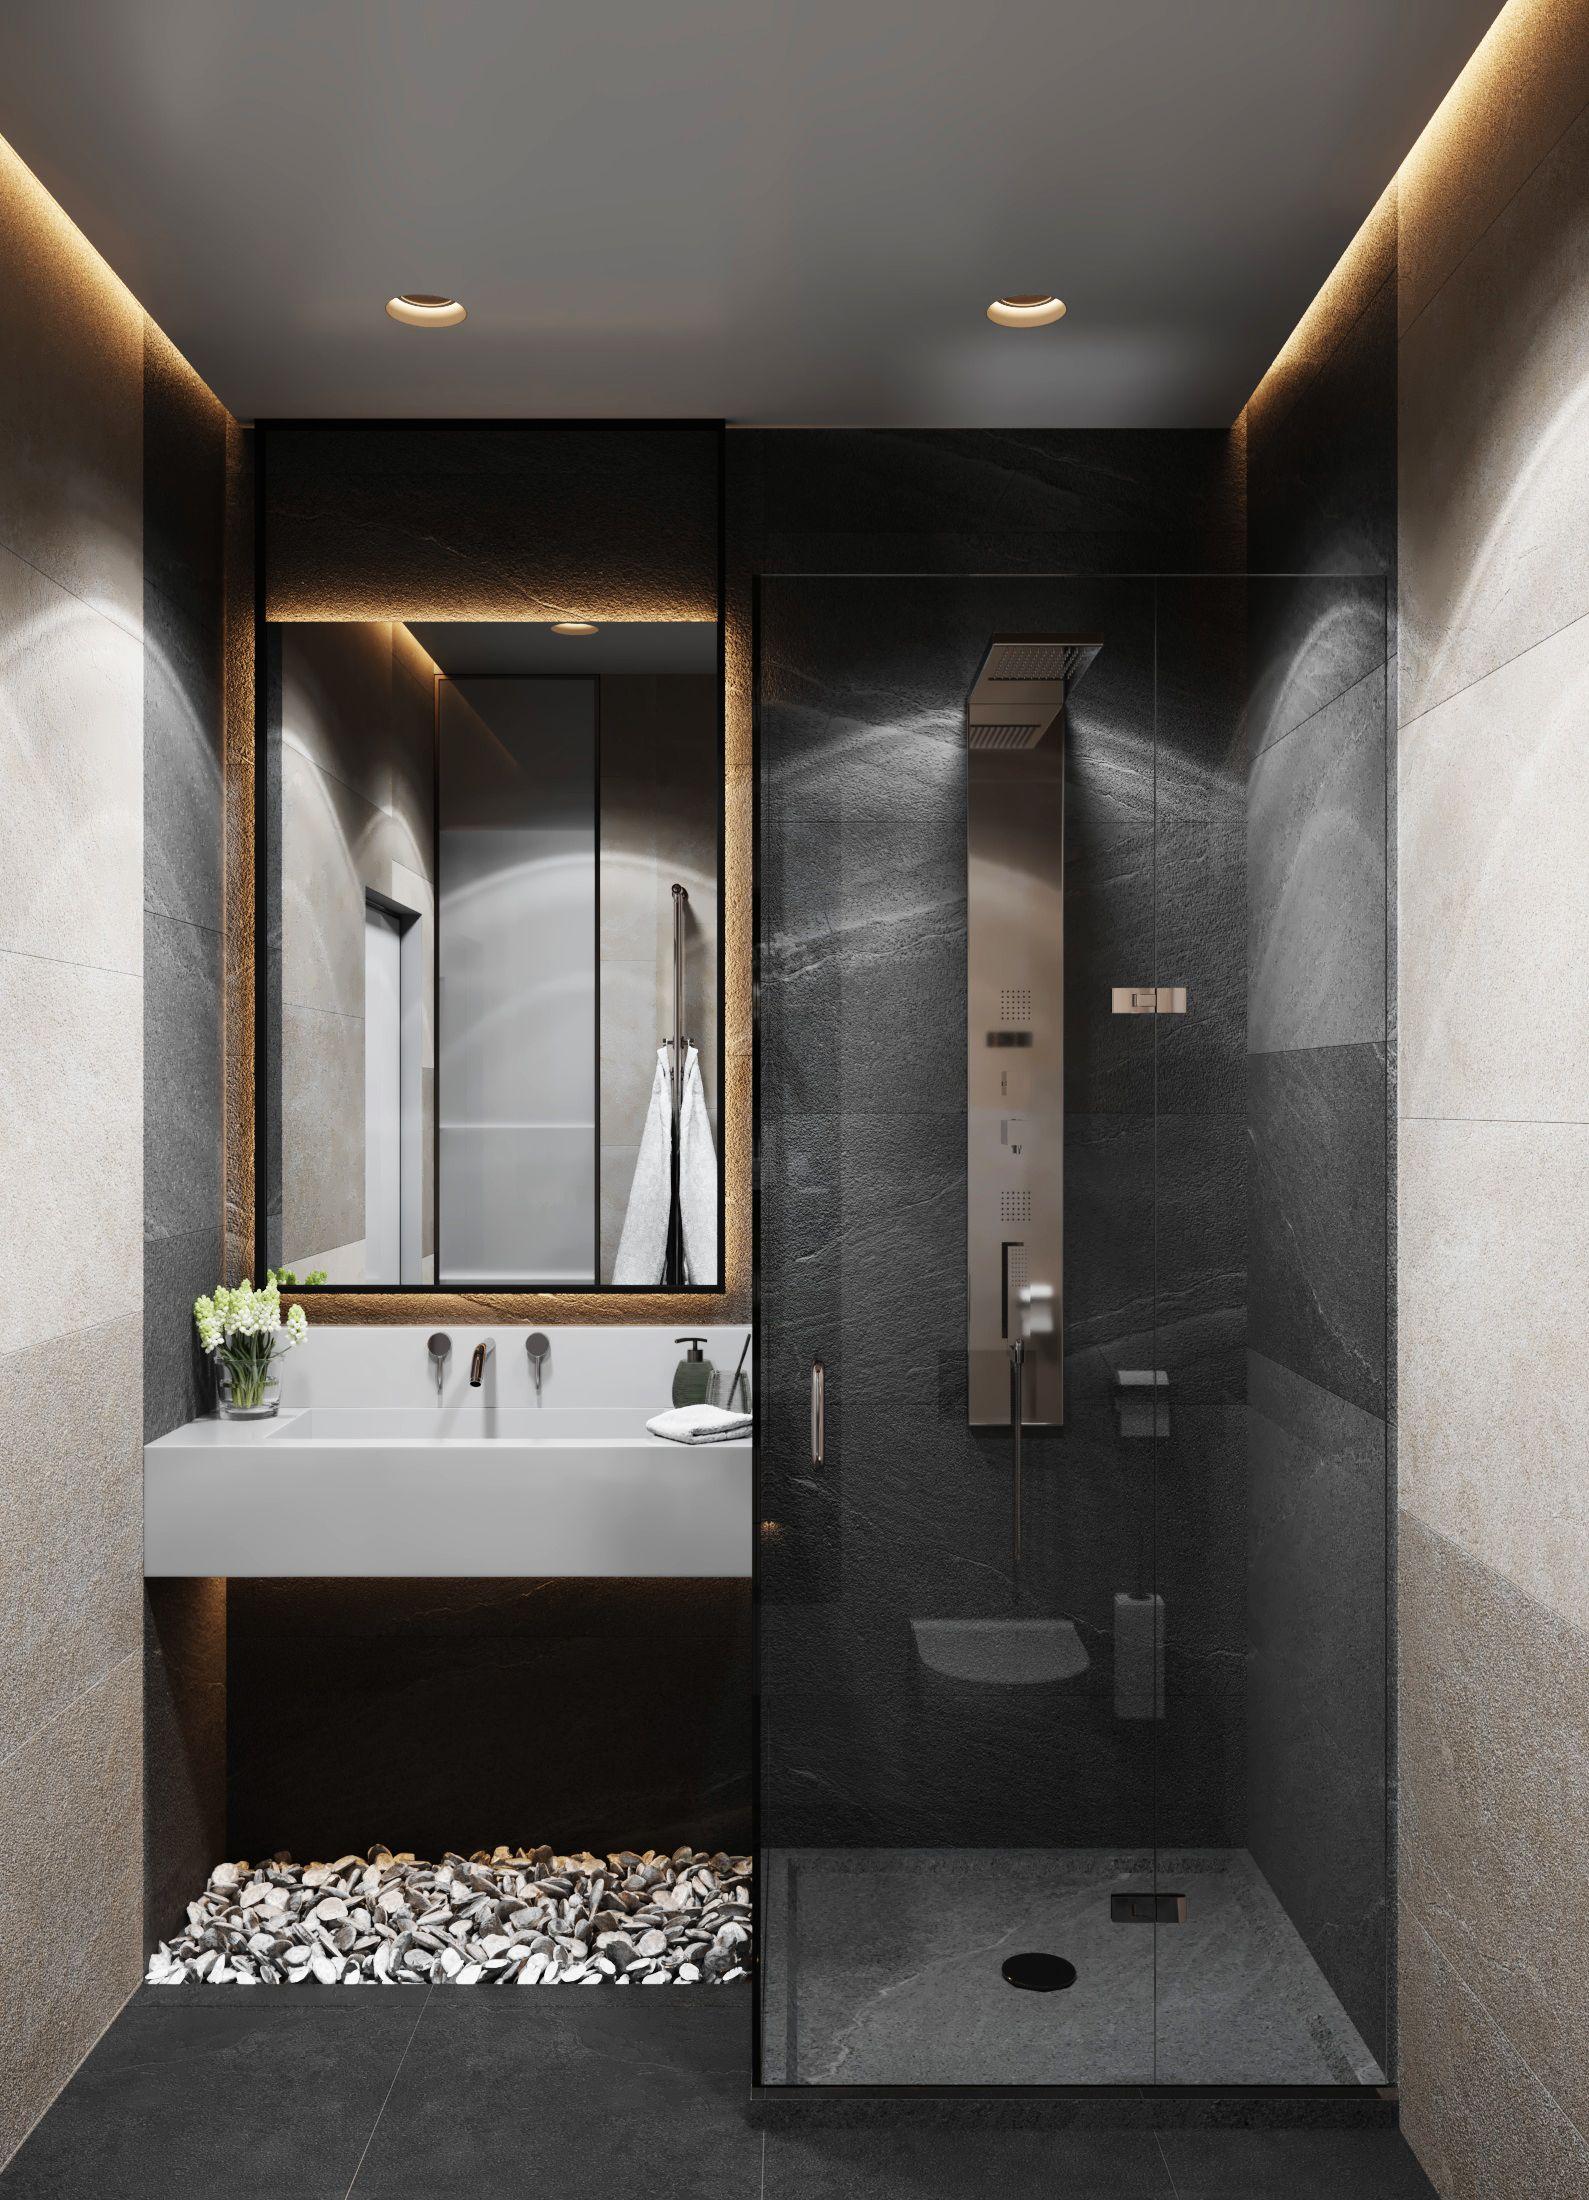 55 Awesome Open Bathroom Concept For Master Bedrooms Decor Ideas Open Bathroom Master Bedrooms Decor Modern Bathroom Design